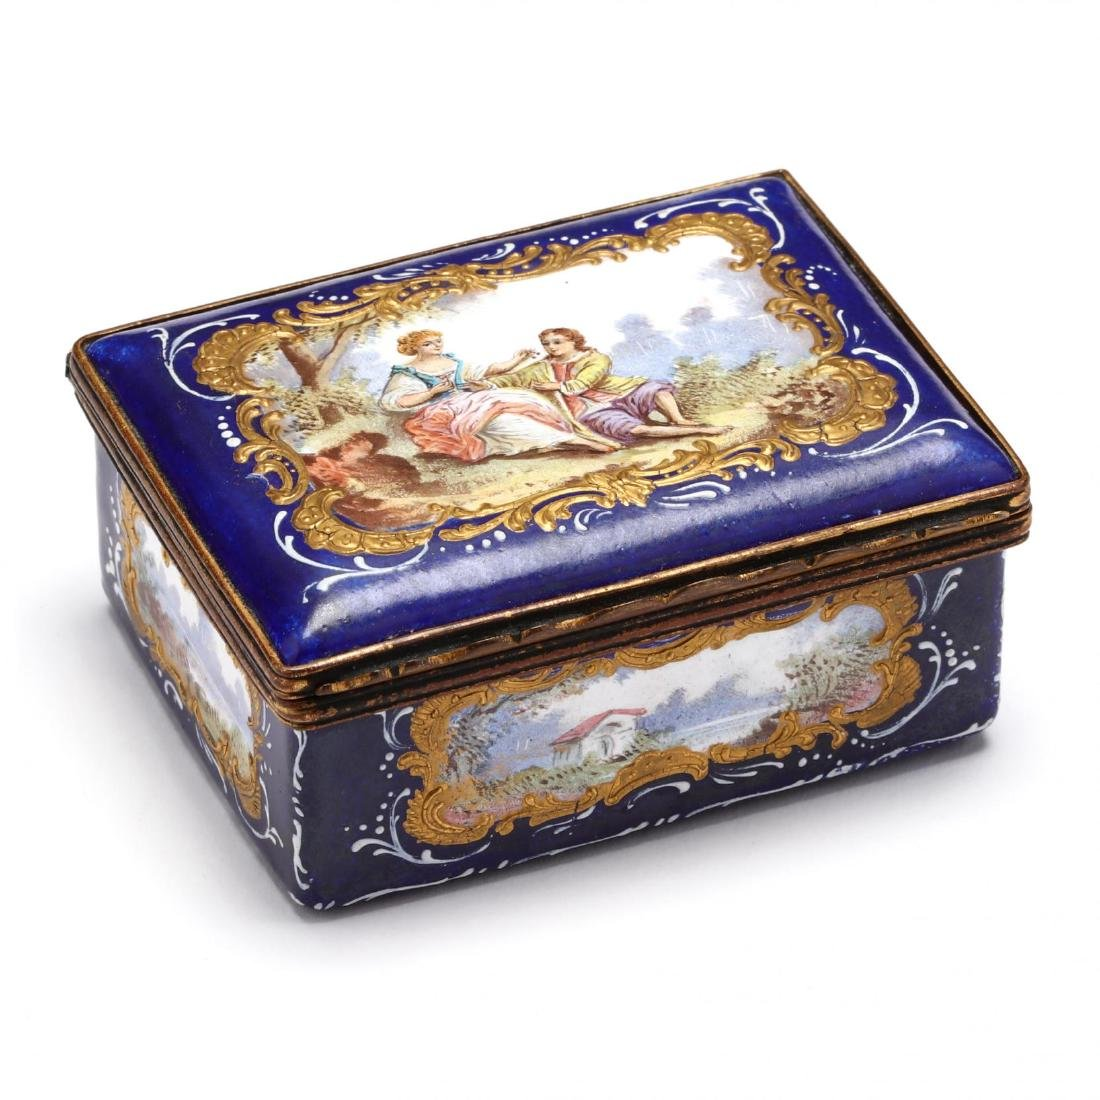 An Antique Enamel Table Box, att. Bilston